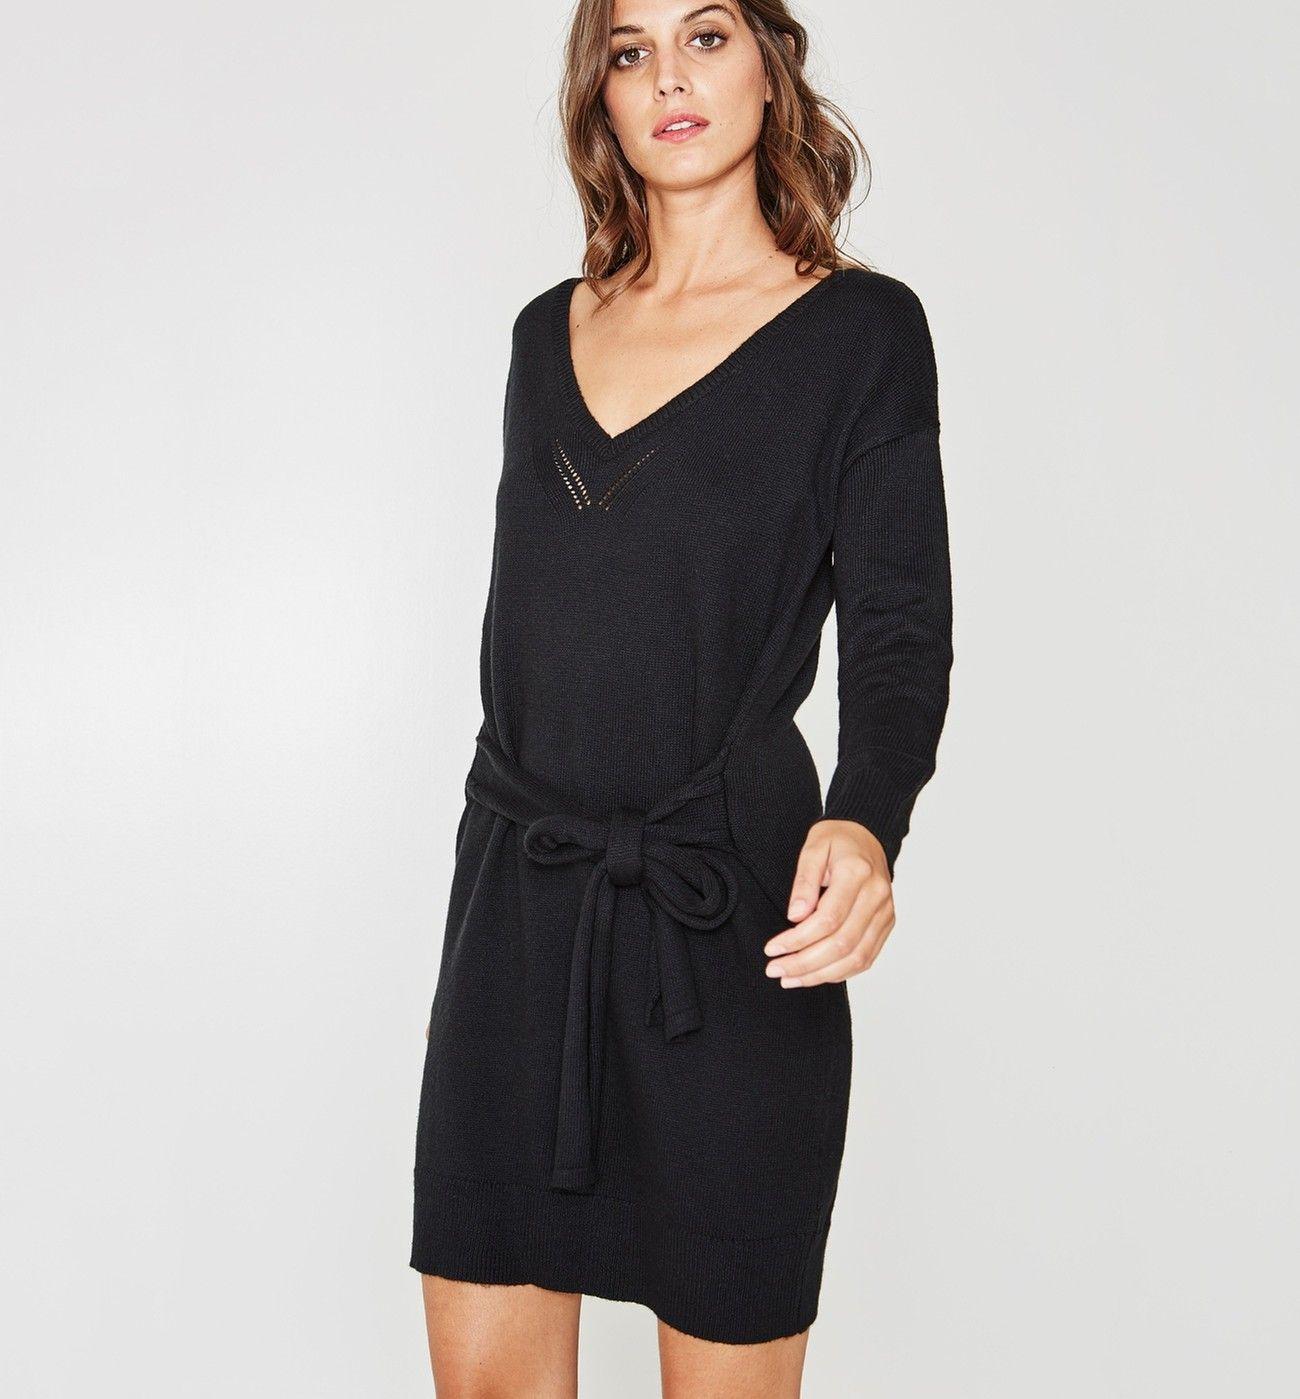 Noir PromodAchats Robes Robe Pull Nouée Femme rshtQdCx